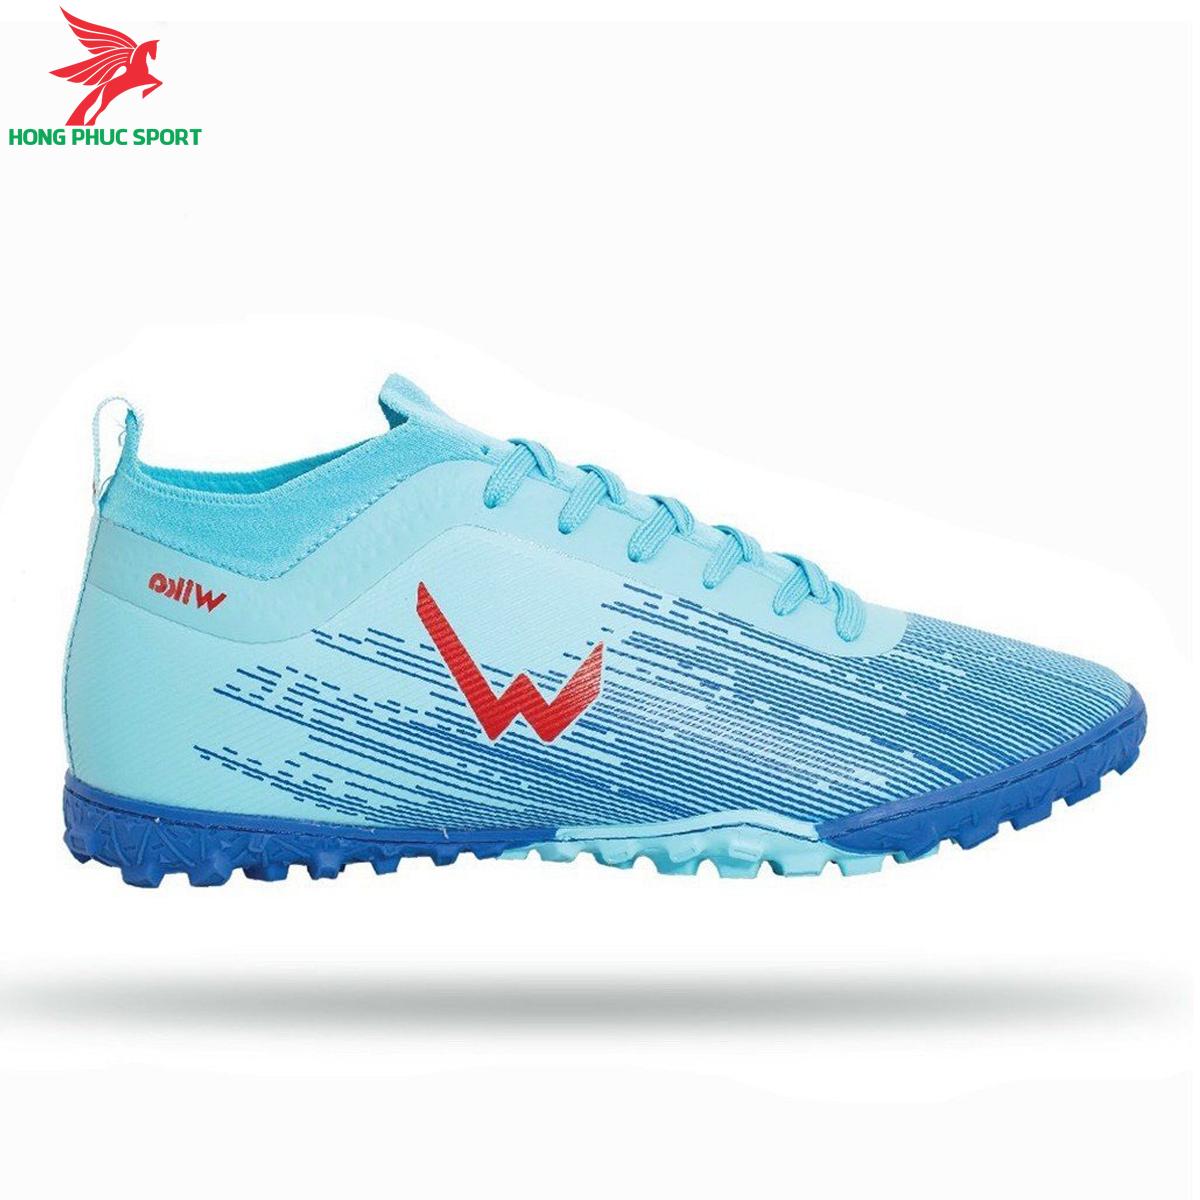 https://cdn.hongphucsport.com/unsafe/s4.shopbay.vn/files/285/giay-da-bong-wika-subasa-xanh-ngoc-san-co-nhan-tao-3-603da1ba9af95.png